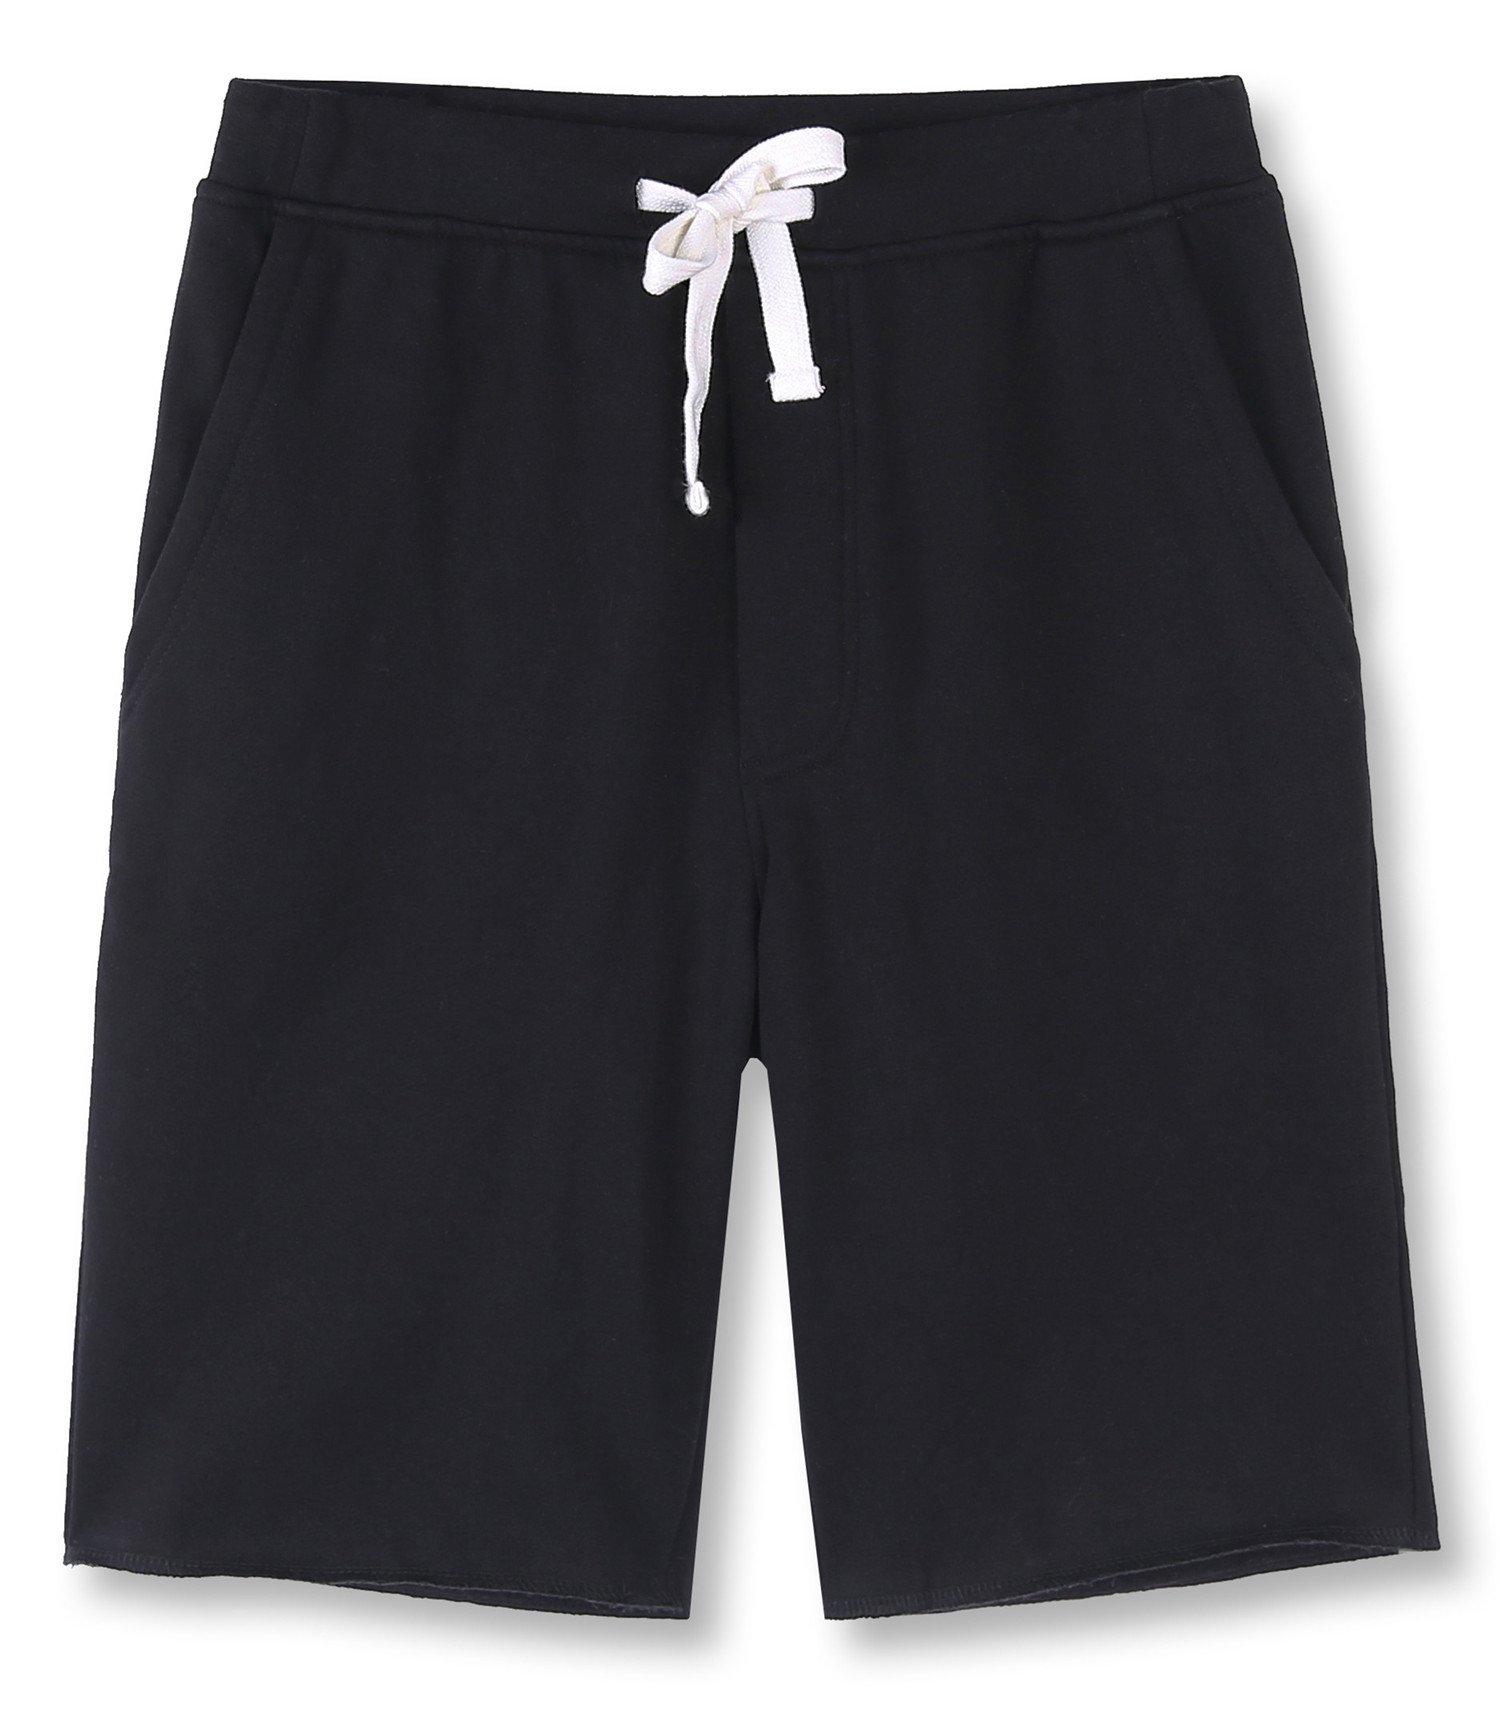 HETHCODE Men's Casual Classic Fit Cotton Elastic Fleece Jogger Gym Shorts Black M